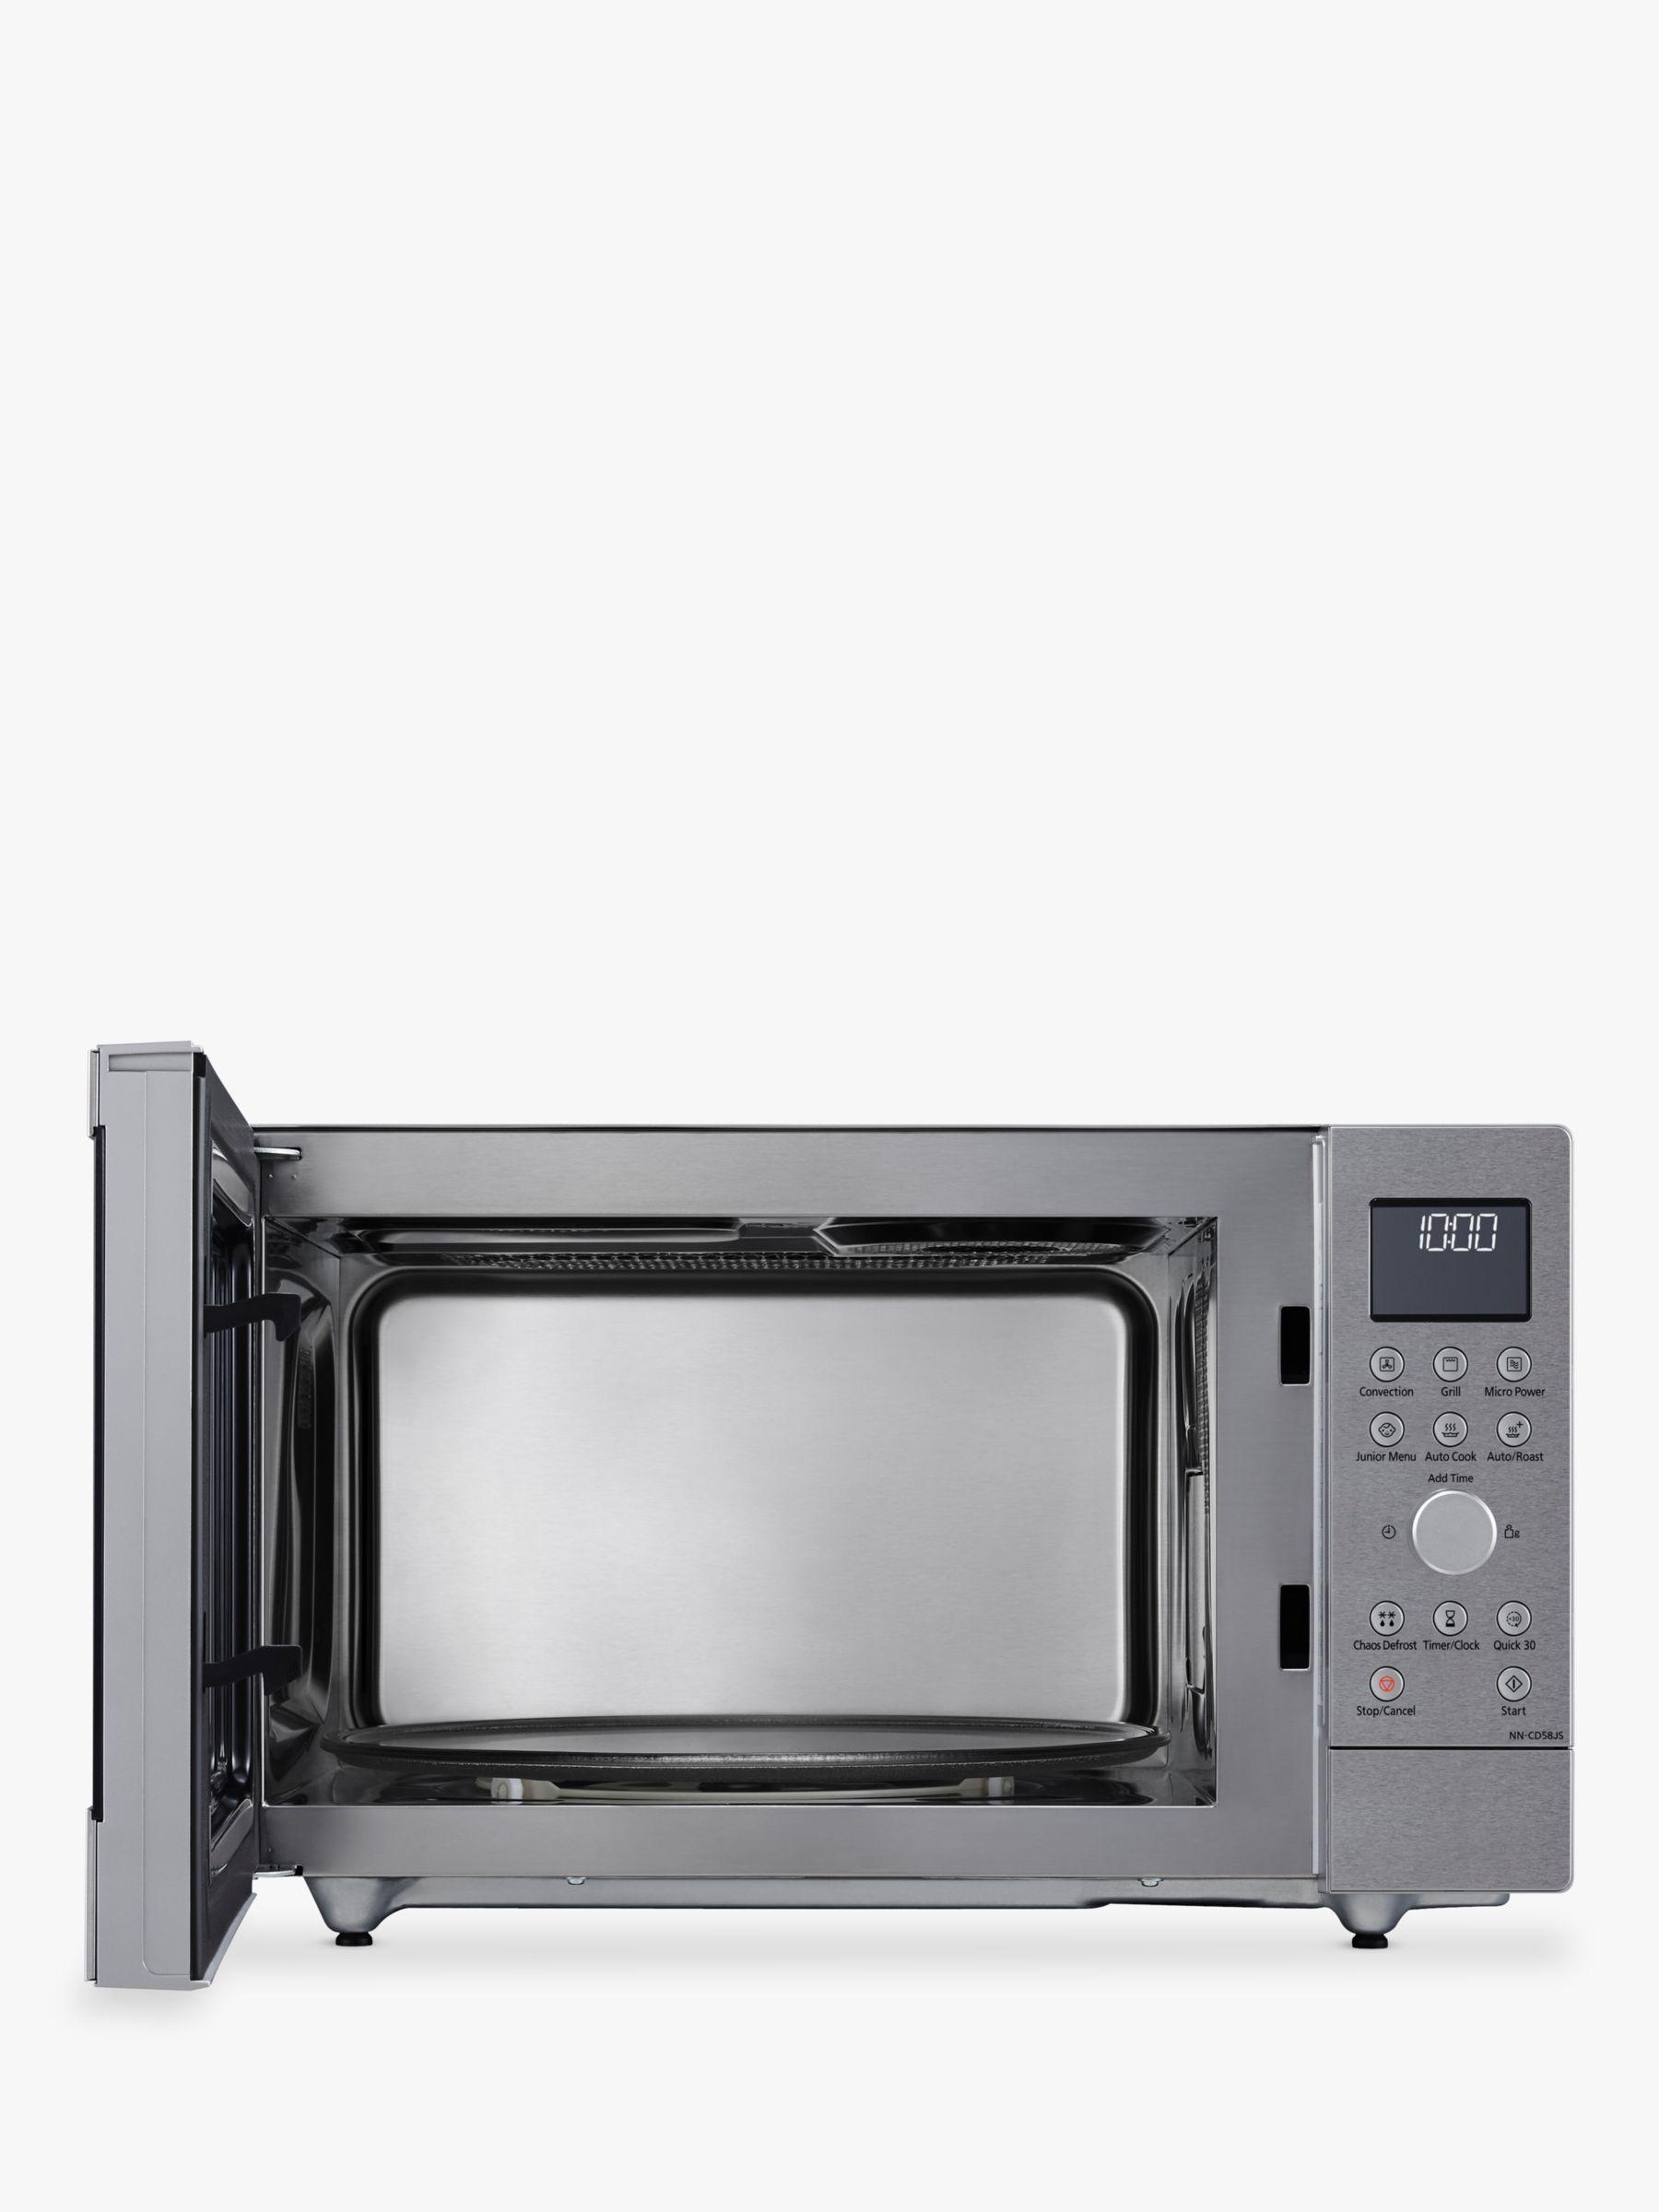 panasonic nn cd58jsbpq 27l slimline combination microwave oven stainless steel